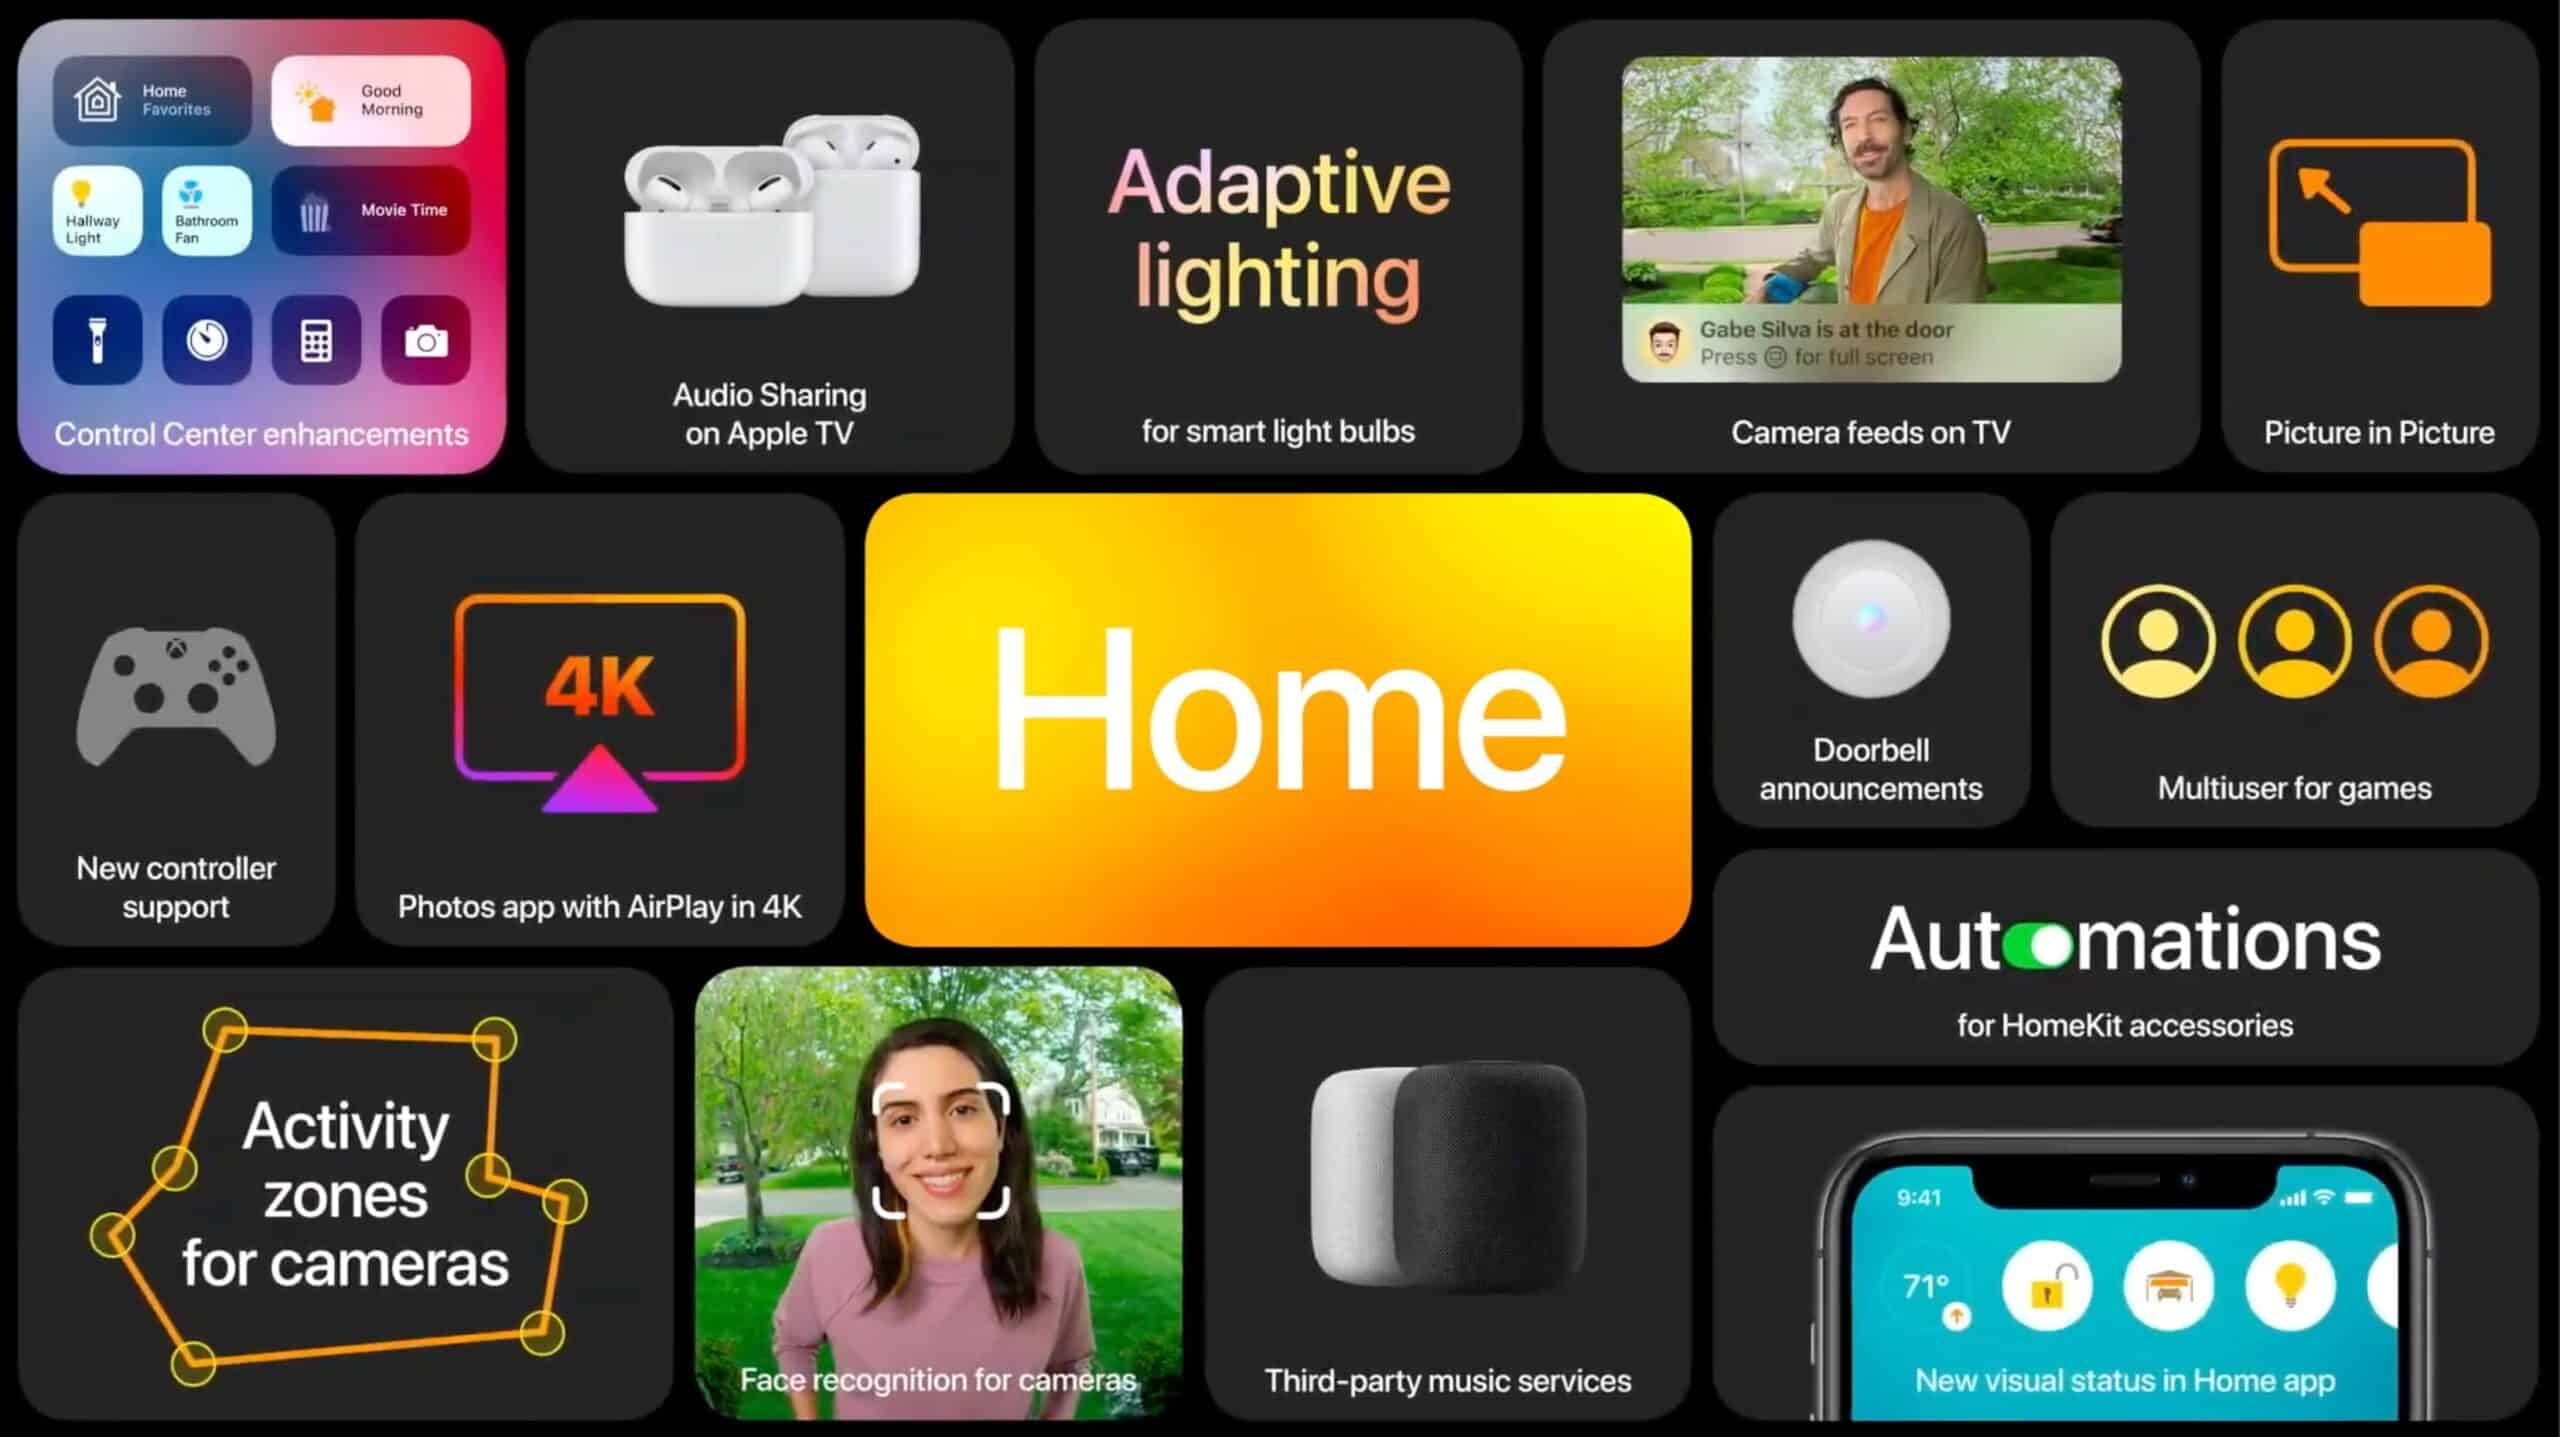 tvOS 14: Multi-user gaming, AirPods sharing, 4K YouTube playback